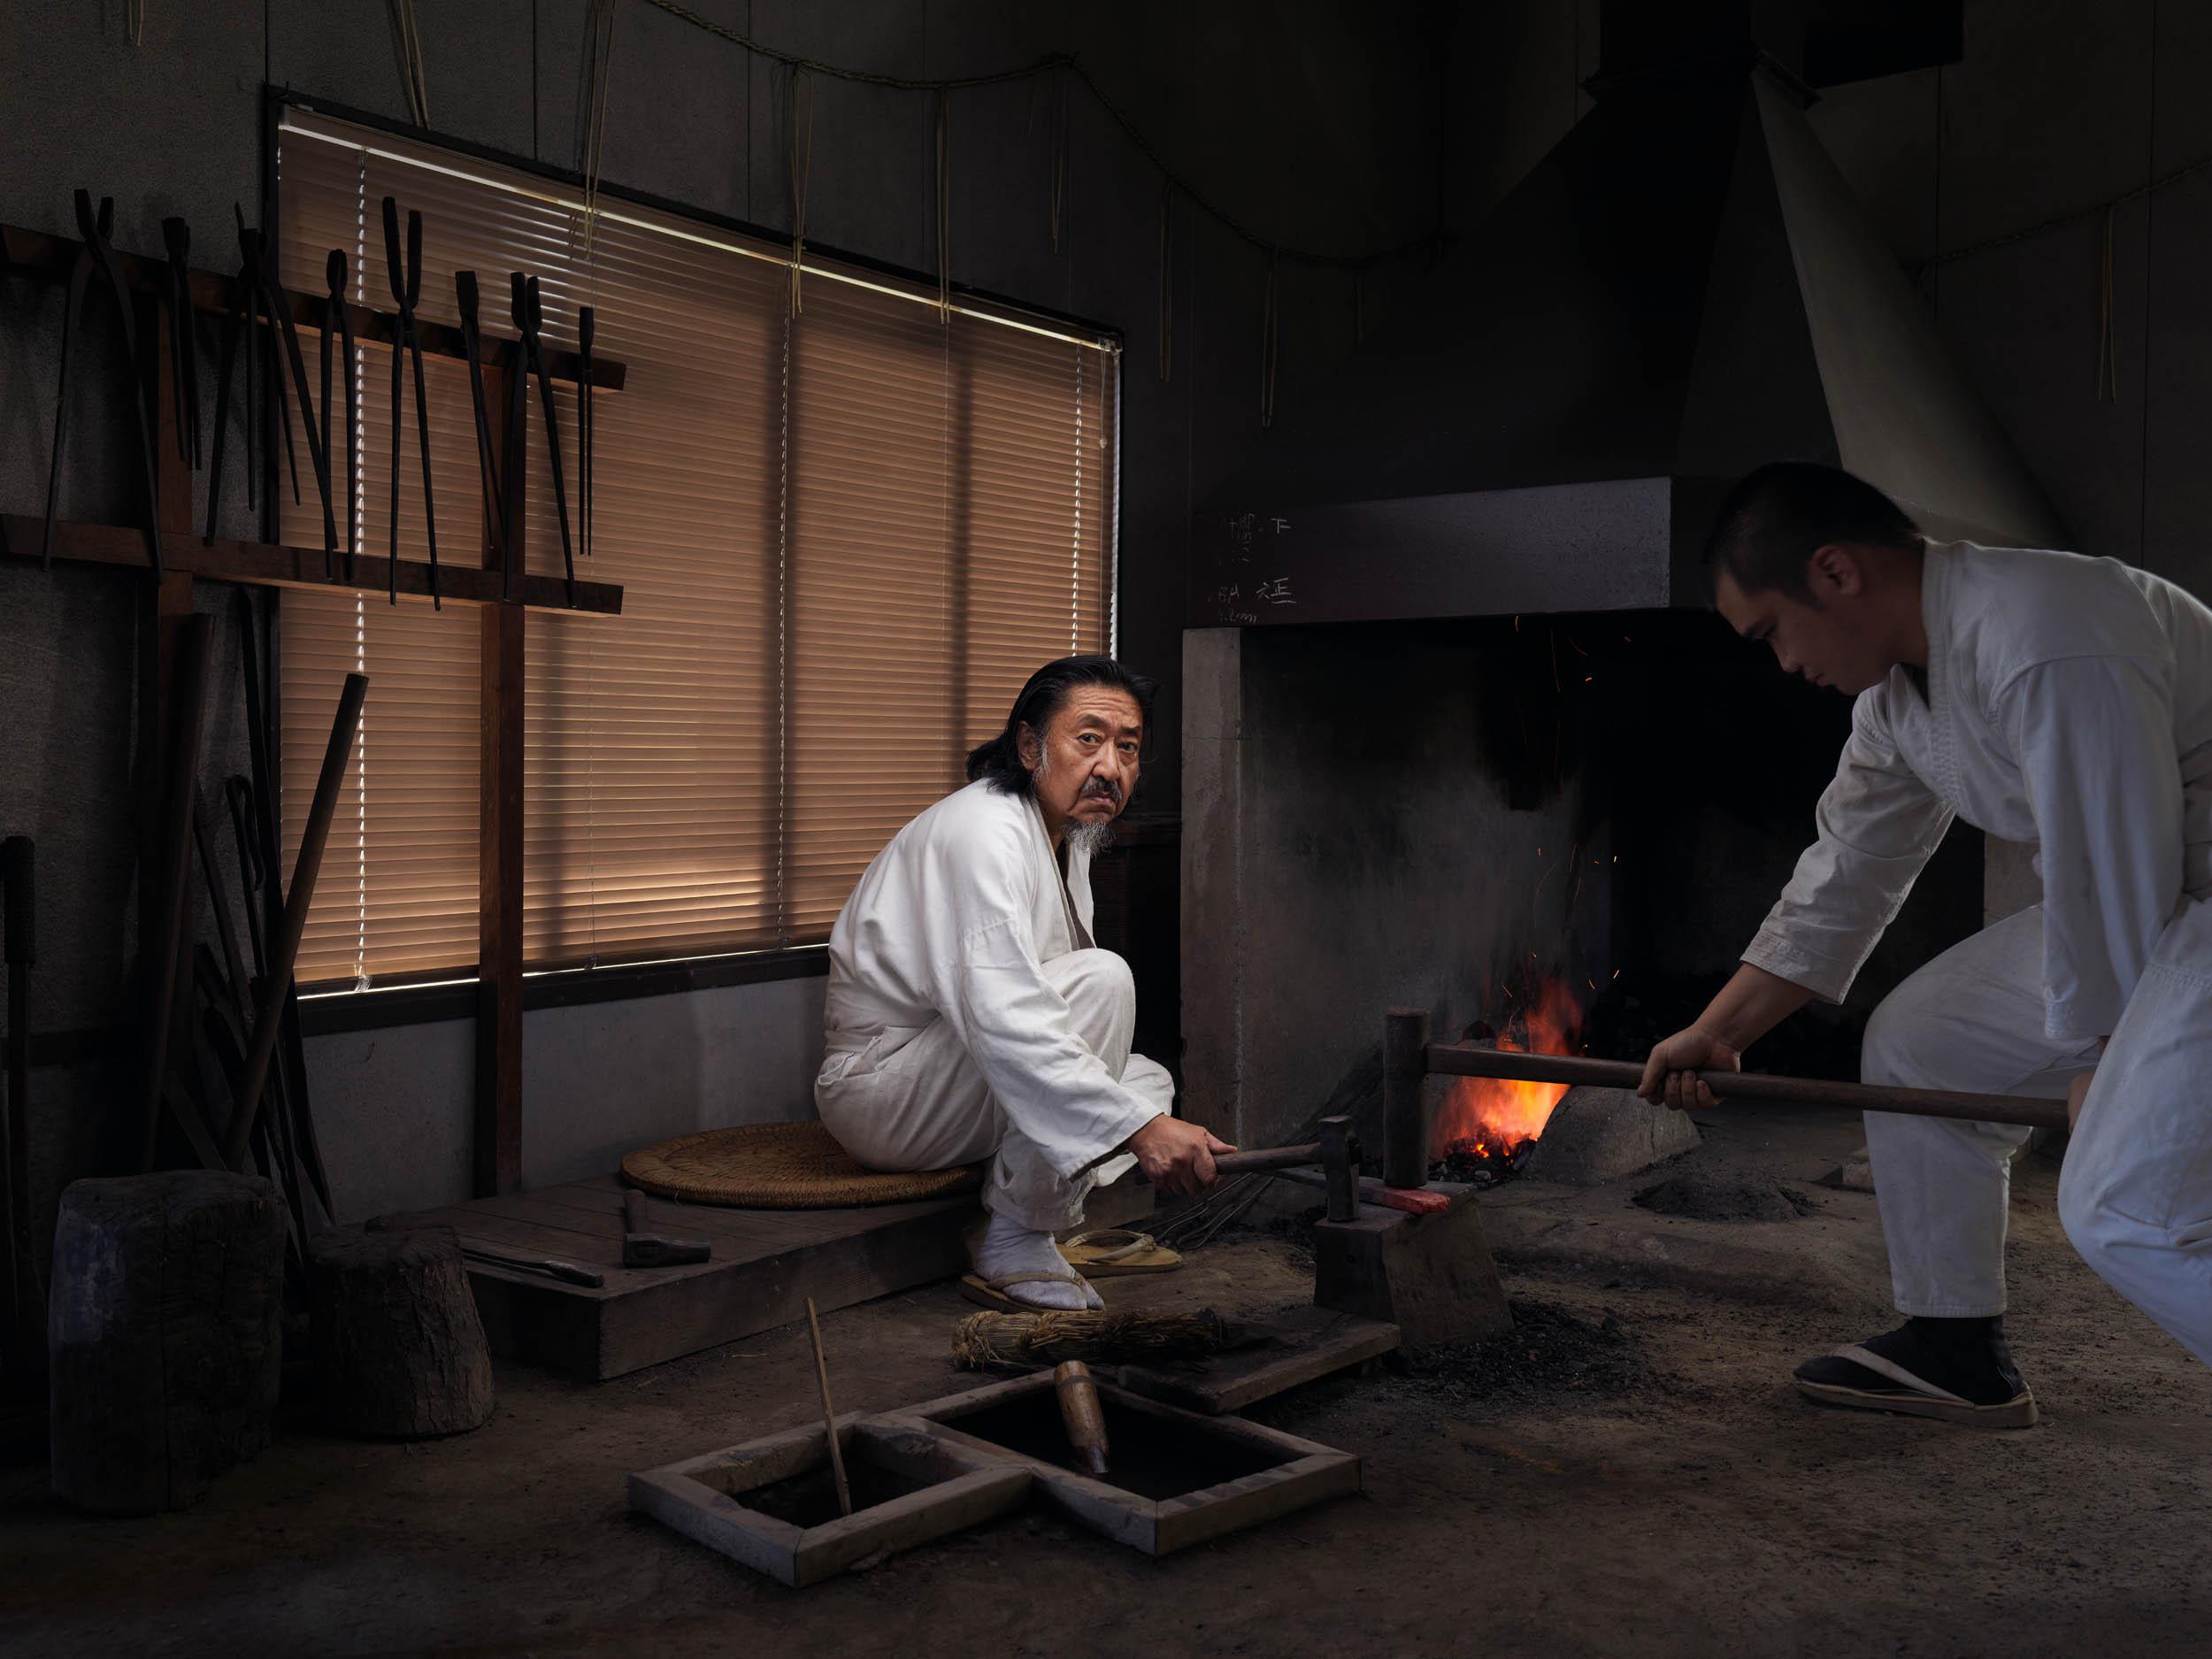 Fujiwara Kanefusa - Sword Maker